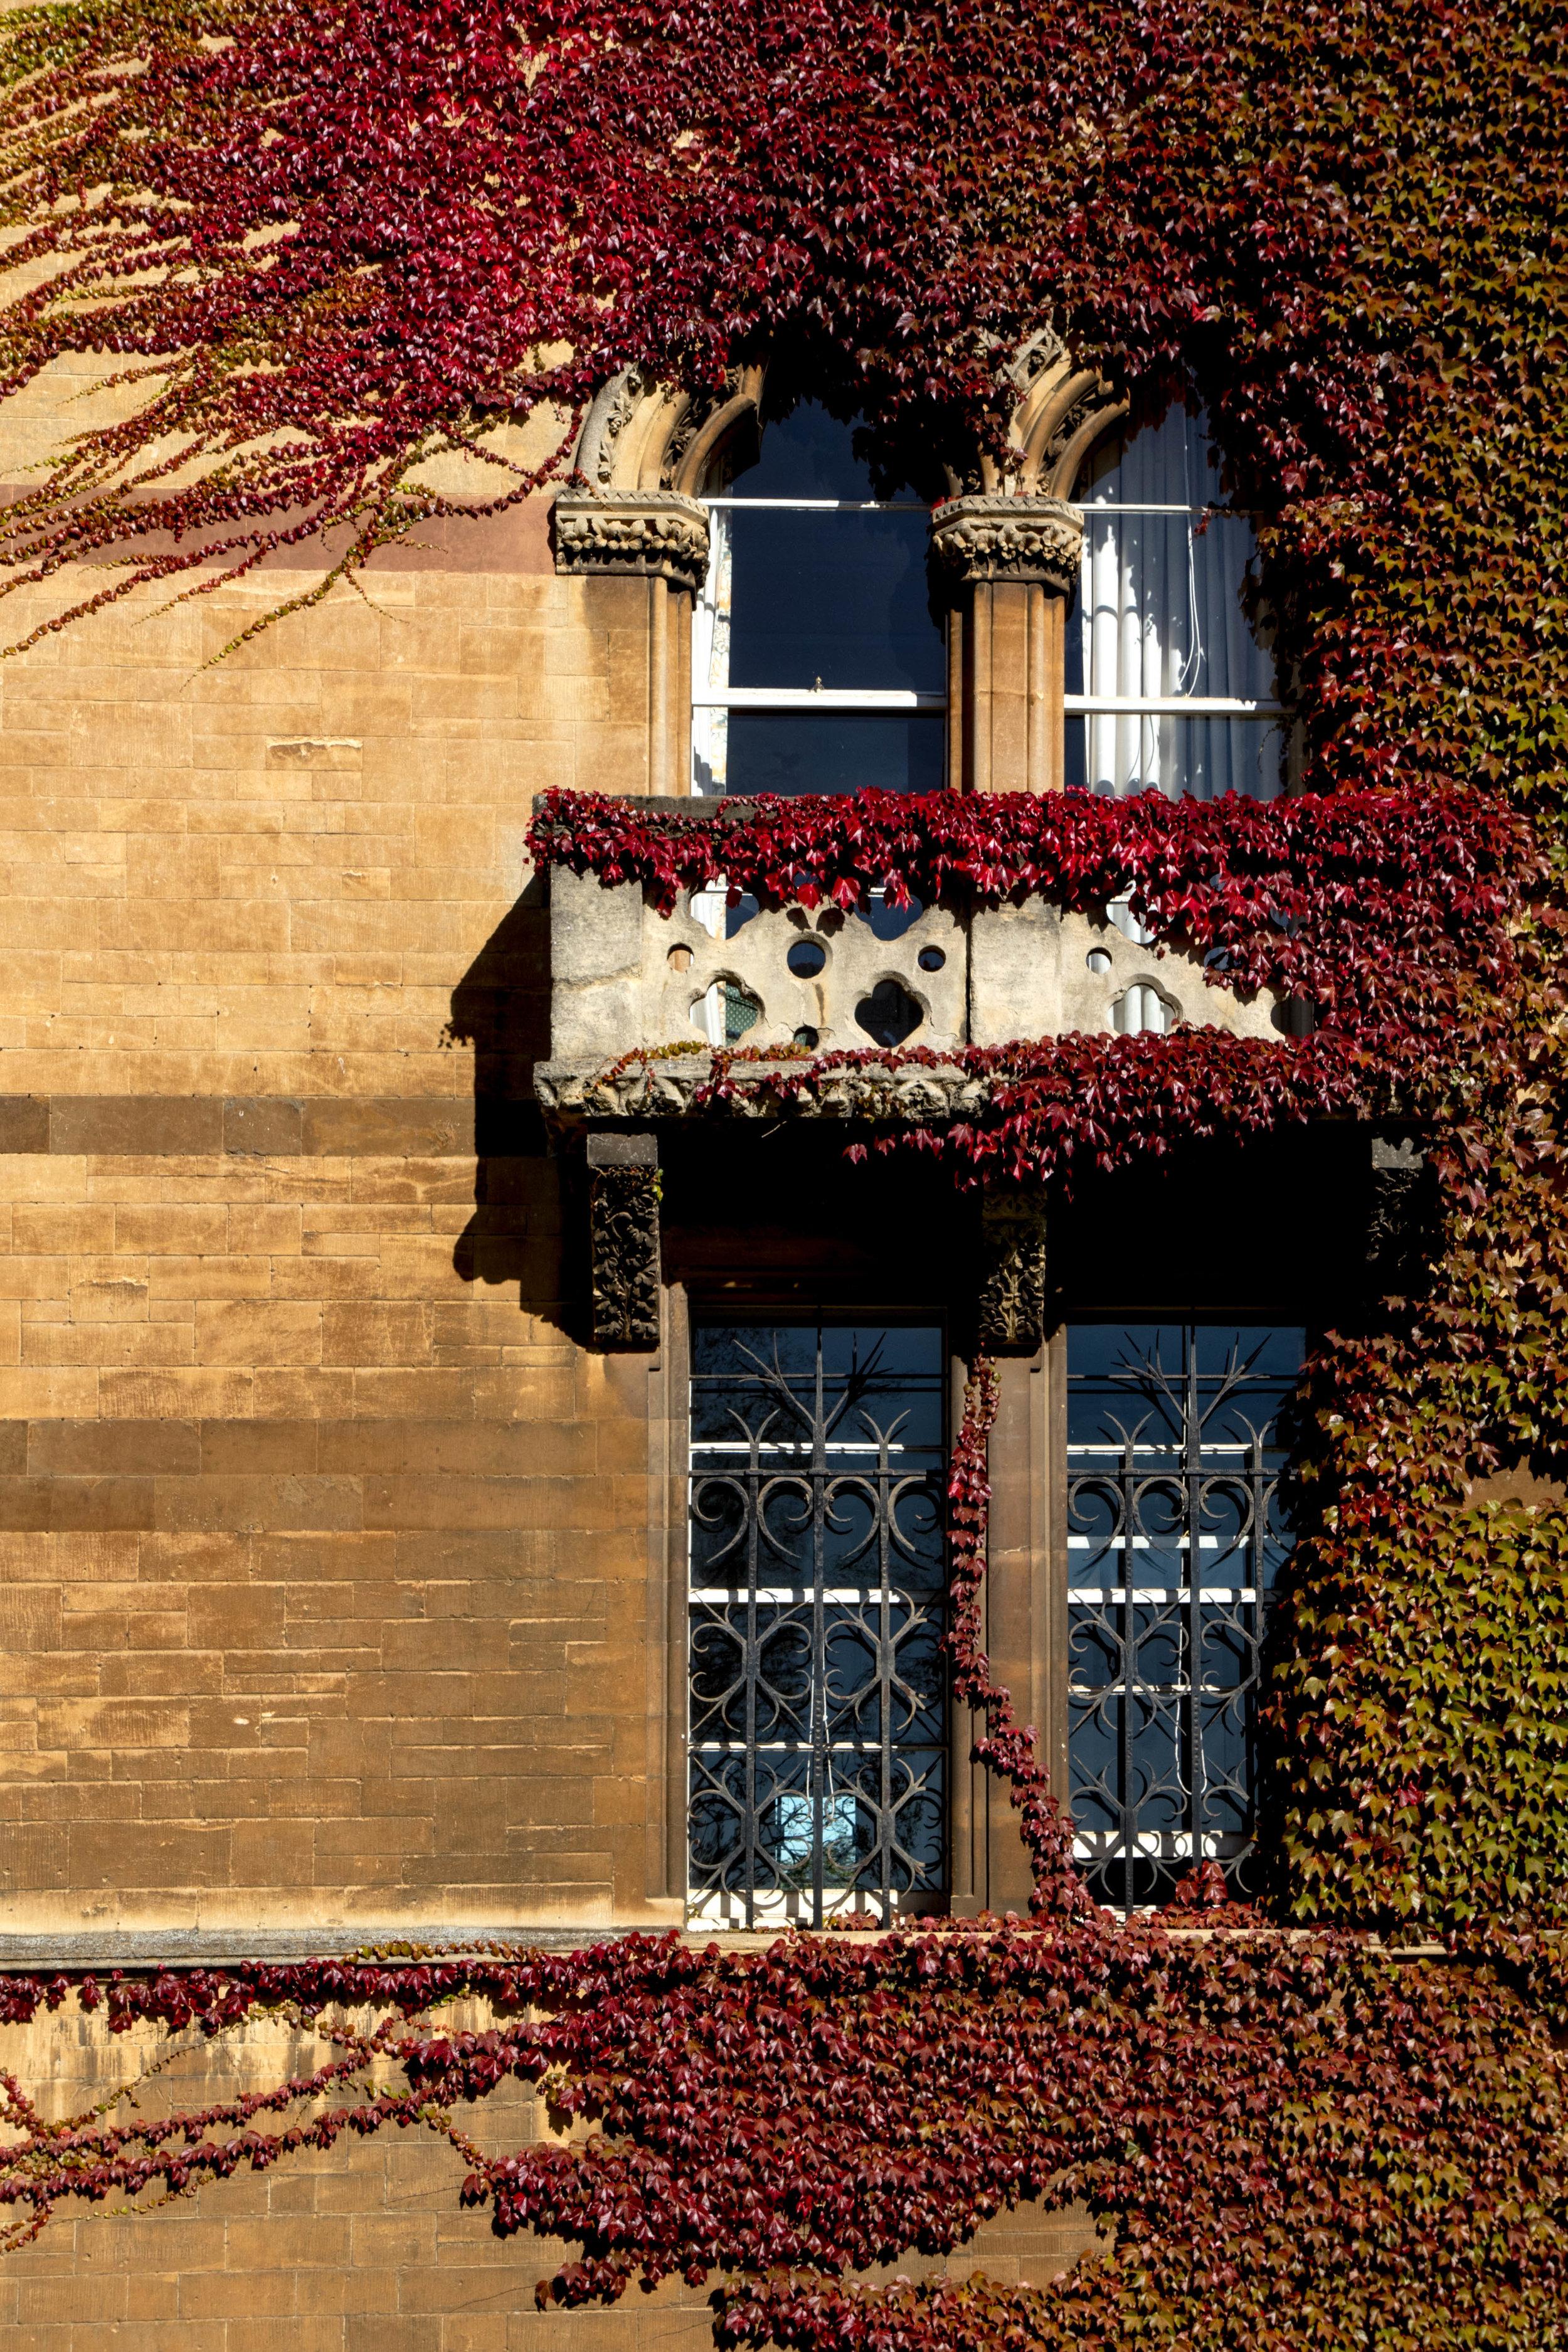 Oxford-ShannonHammondPhotography-3.jpg